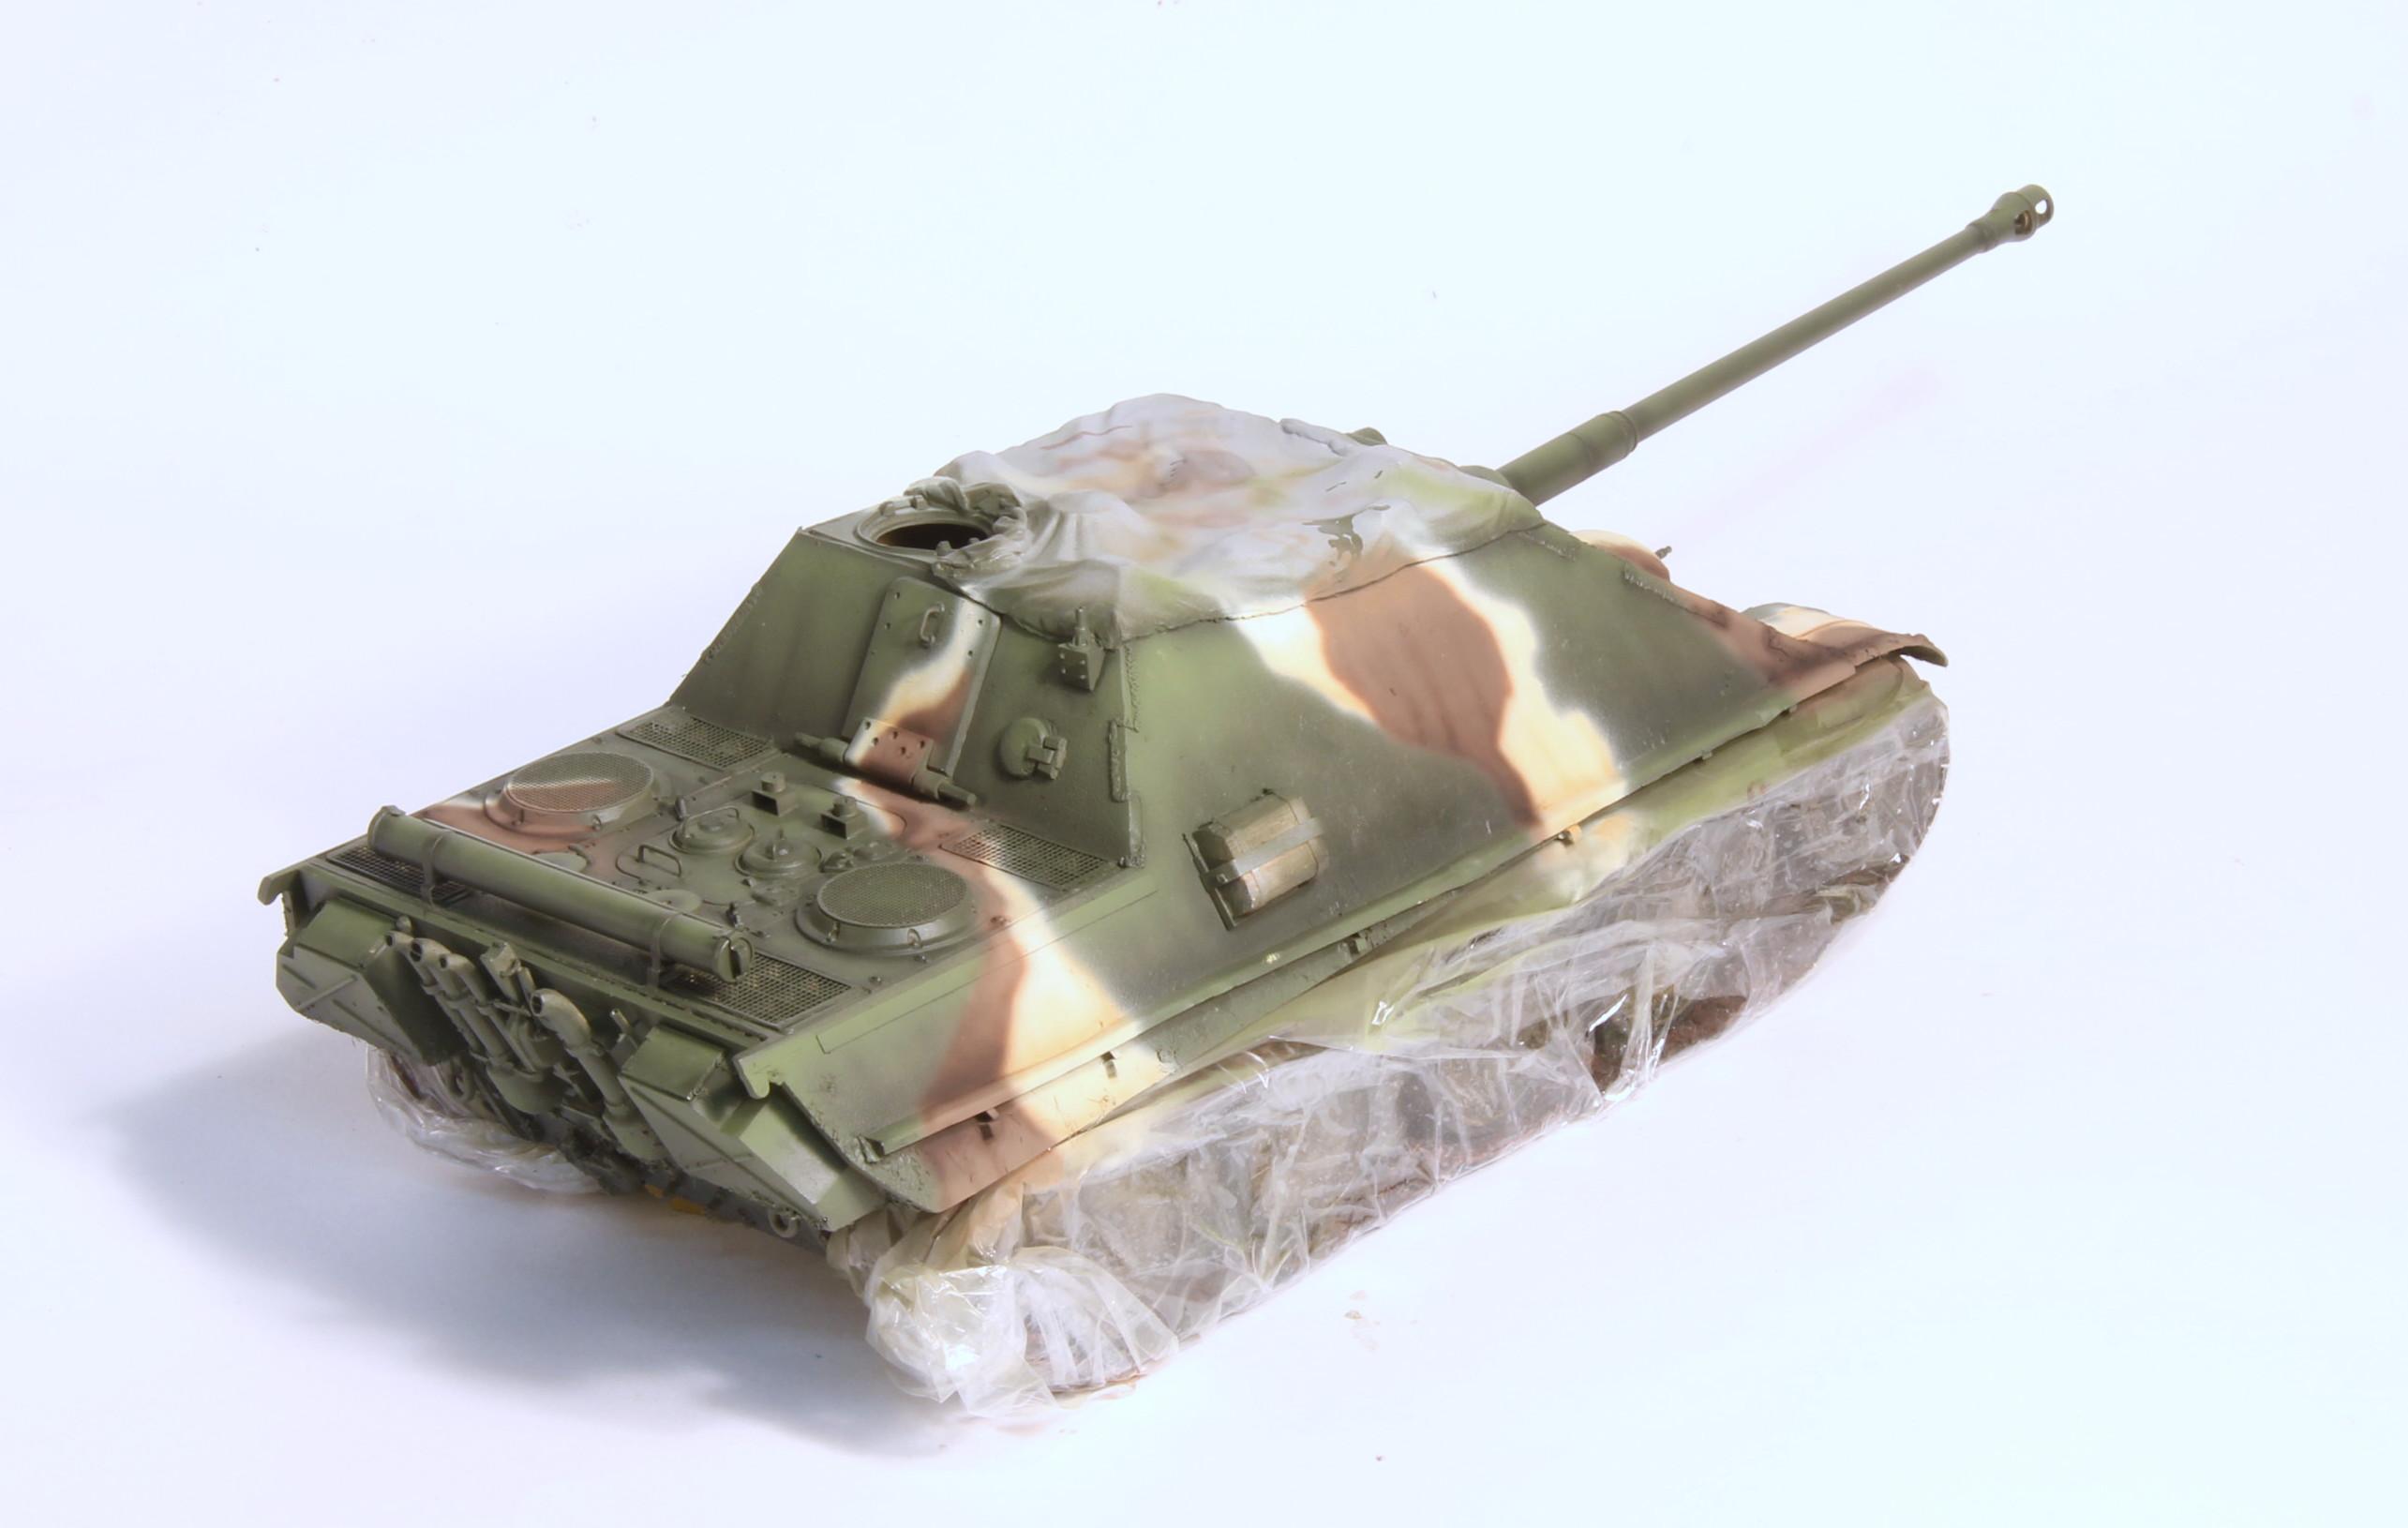 Jagdpanther Tamiya (char fini) 1/35 - Page 2 IMG_3068